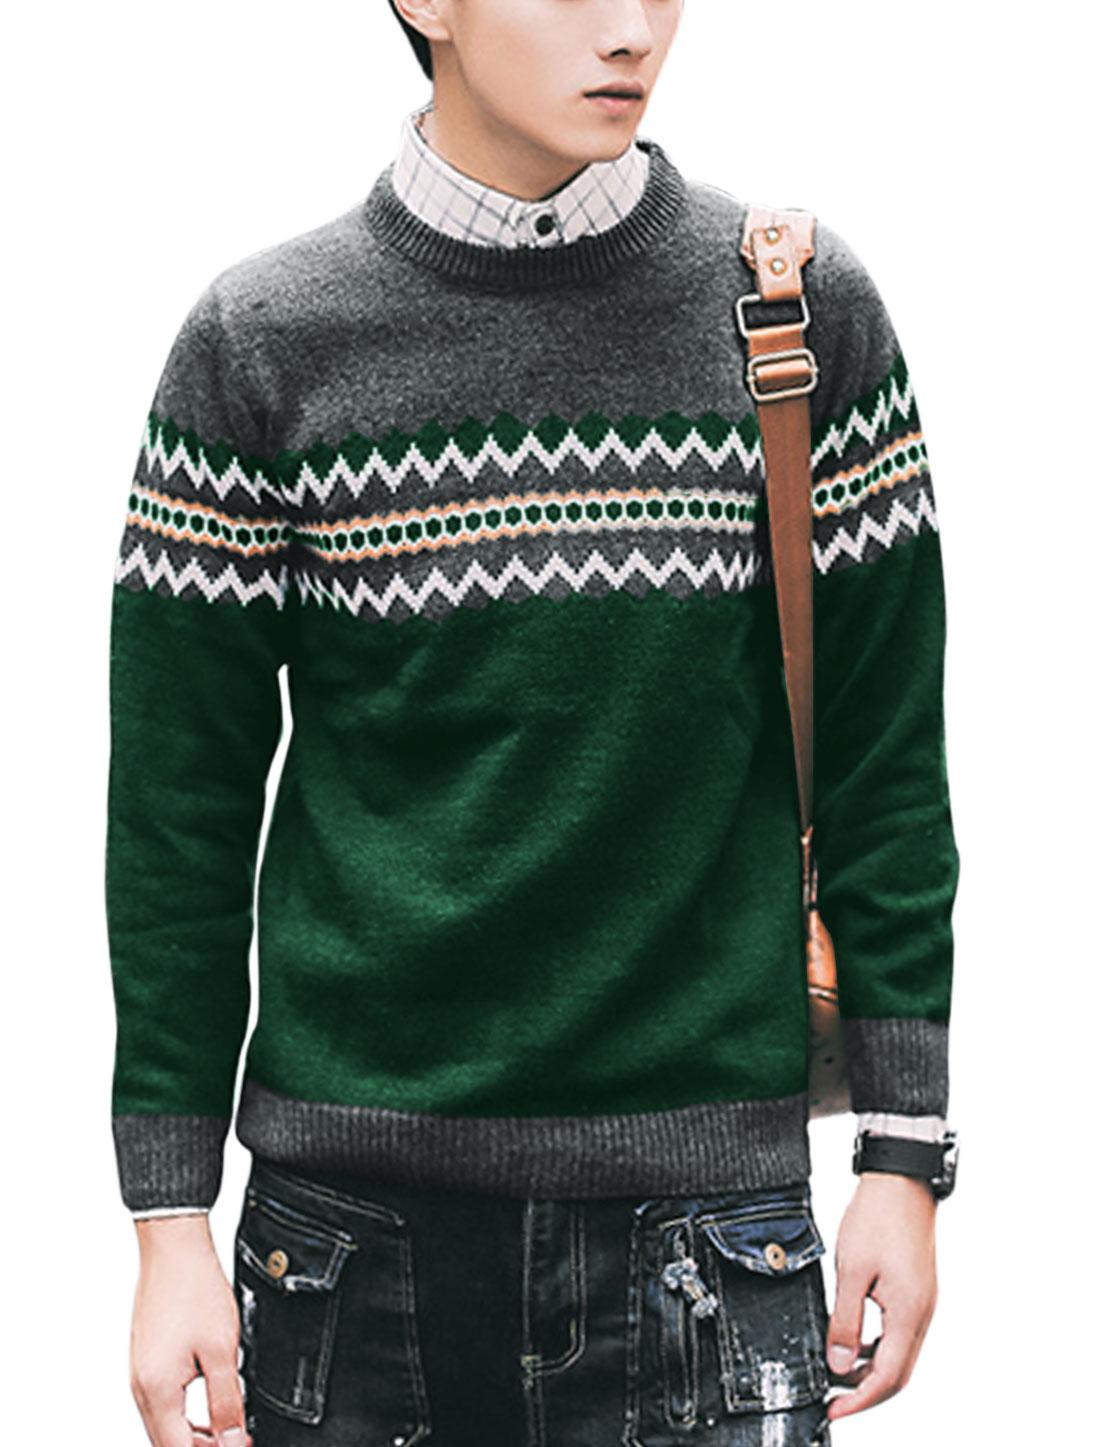 Men Long Sleeve Round Neck Zigzag Knitted Shirt Dark Gray Green M